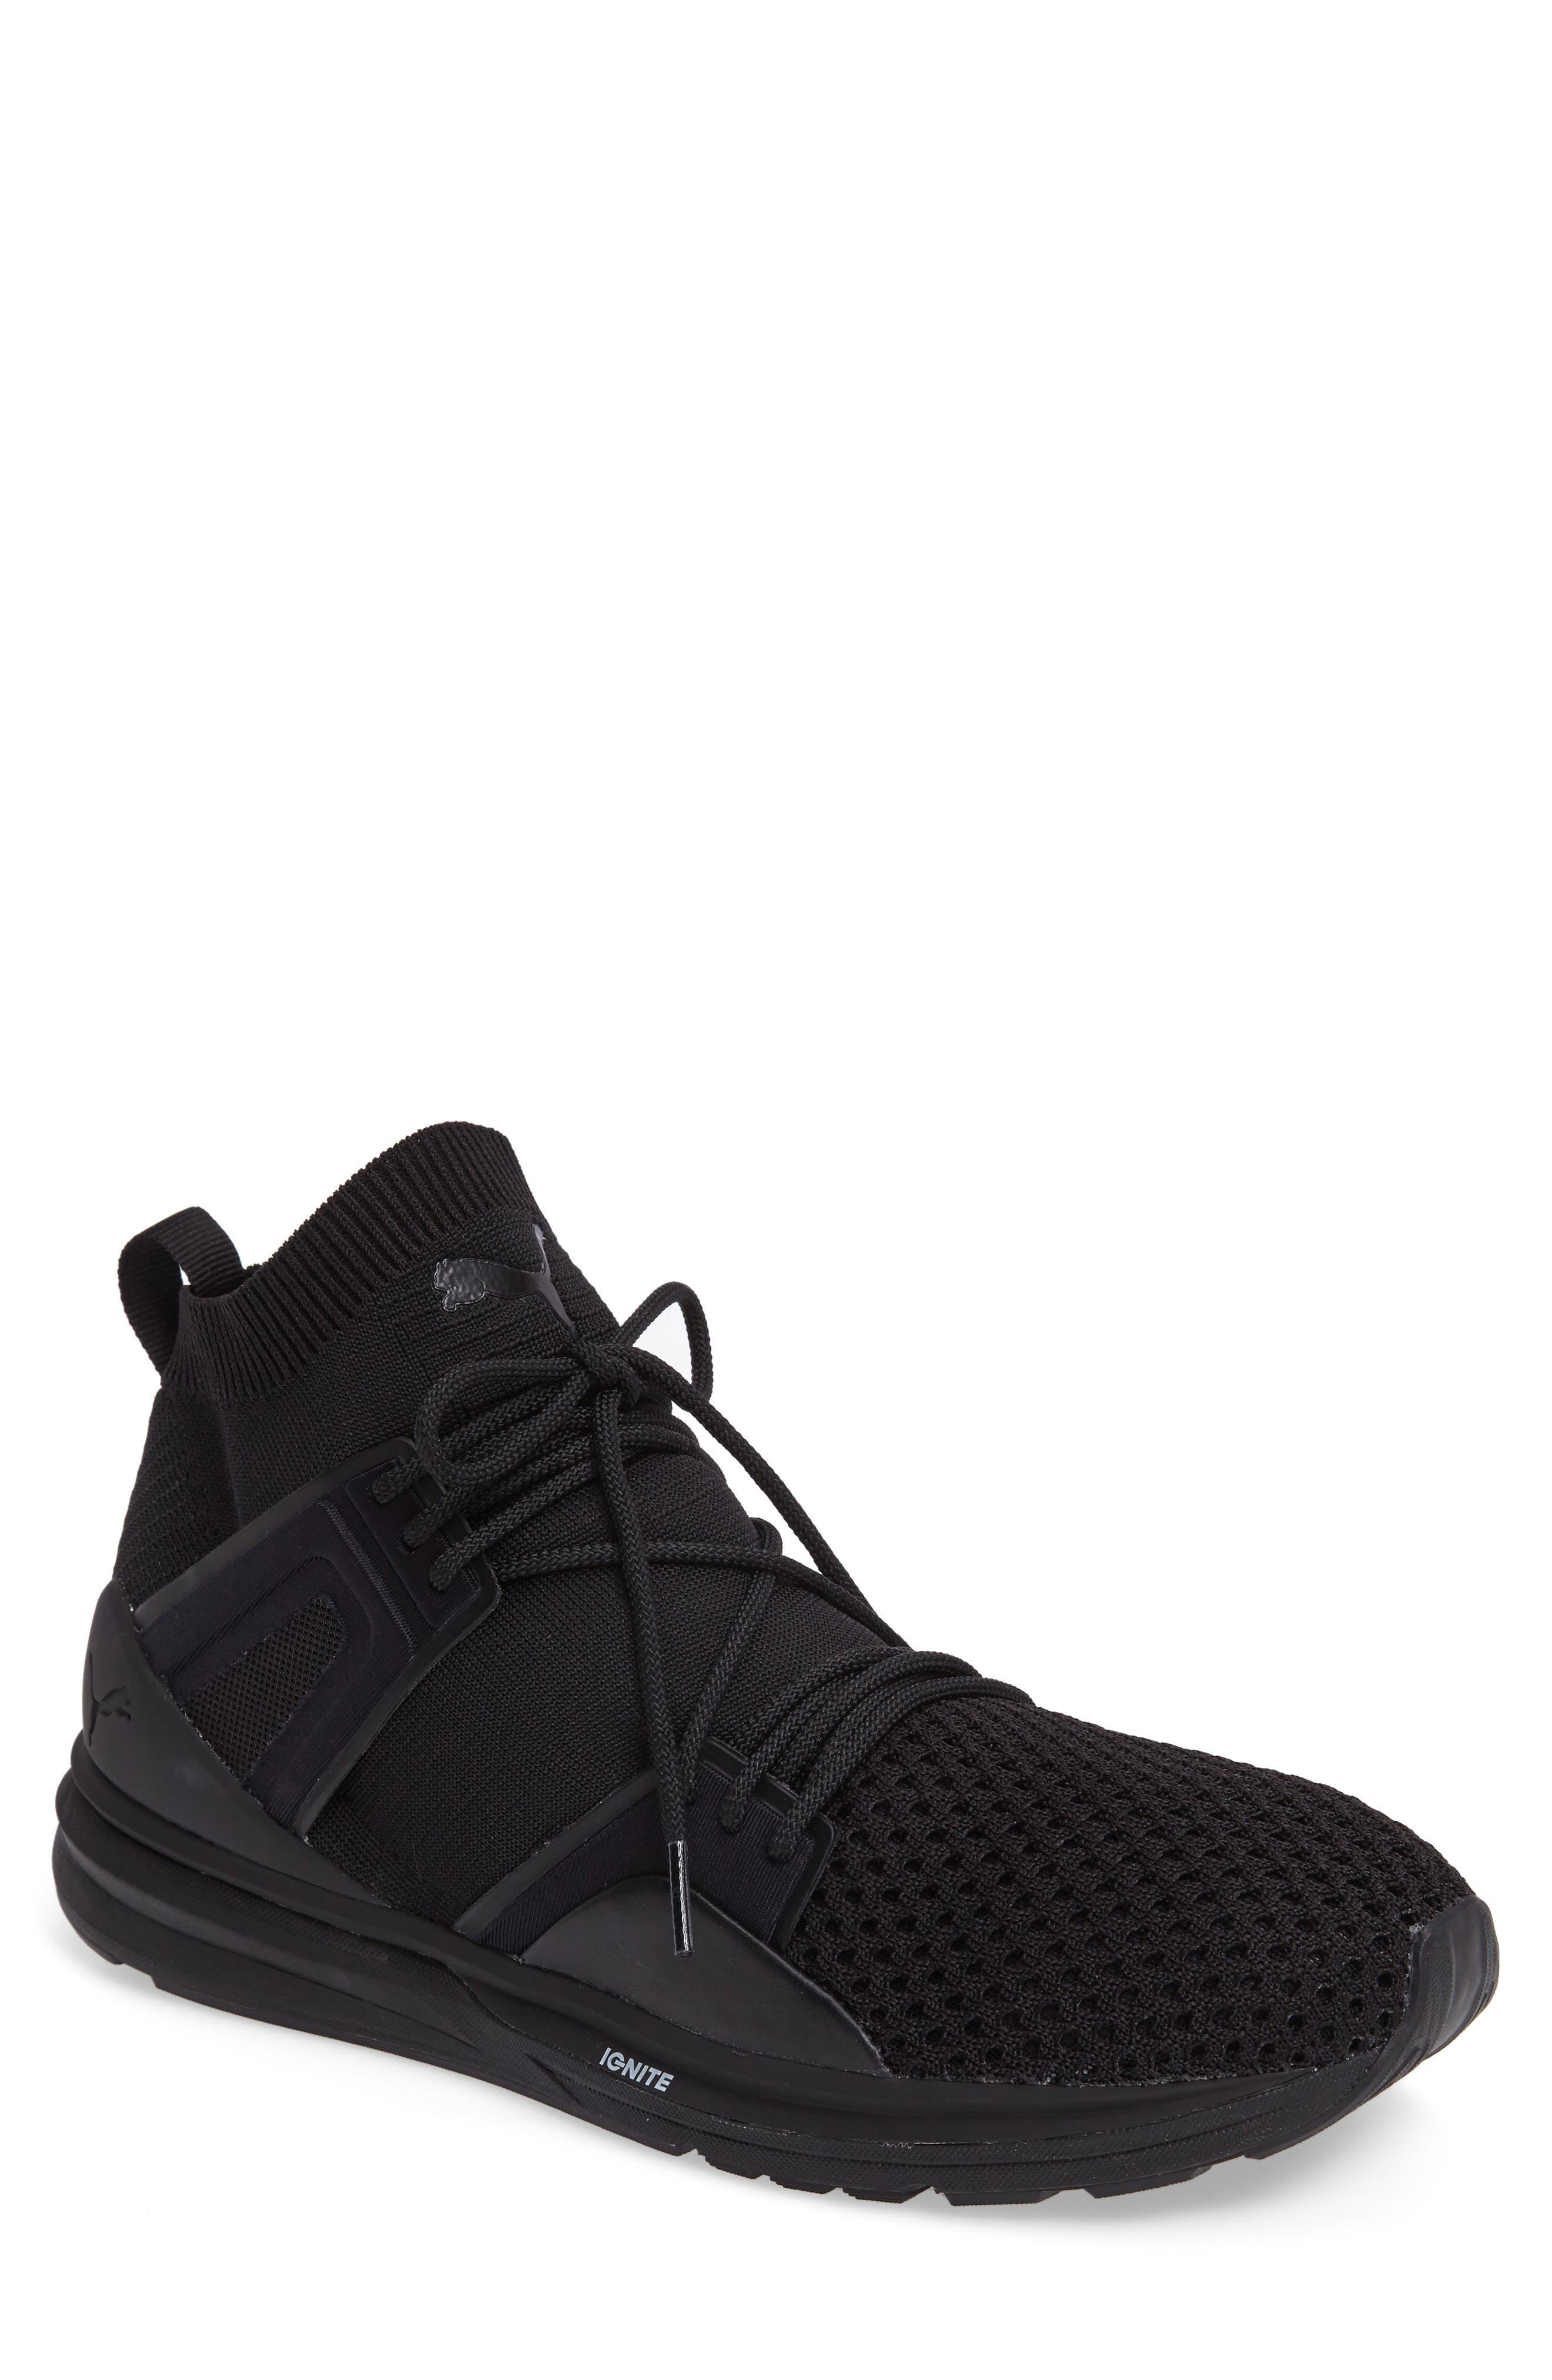 B.O.G. Limitless Hi evoKNIT Sneaker,                         Main,                         color, 001